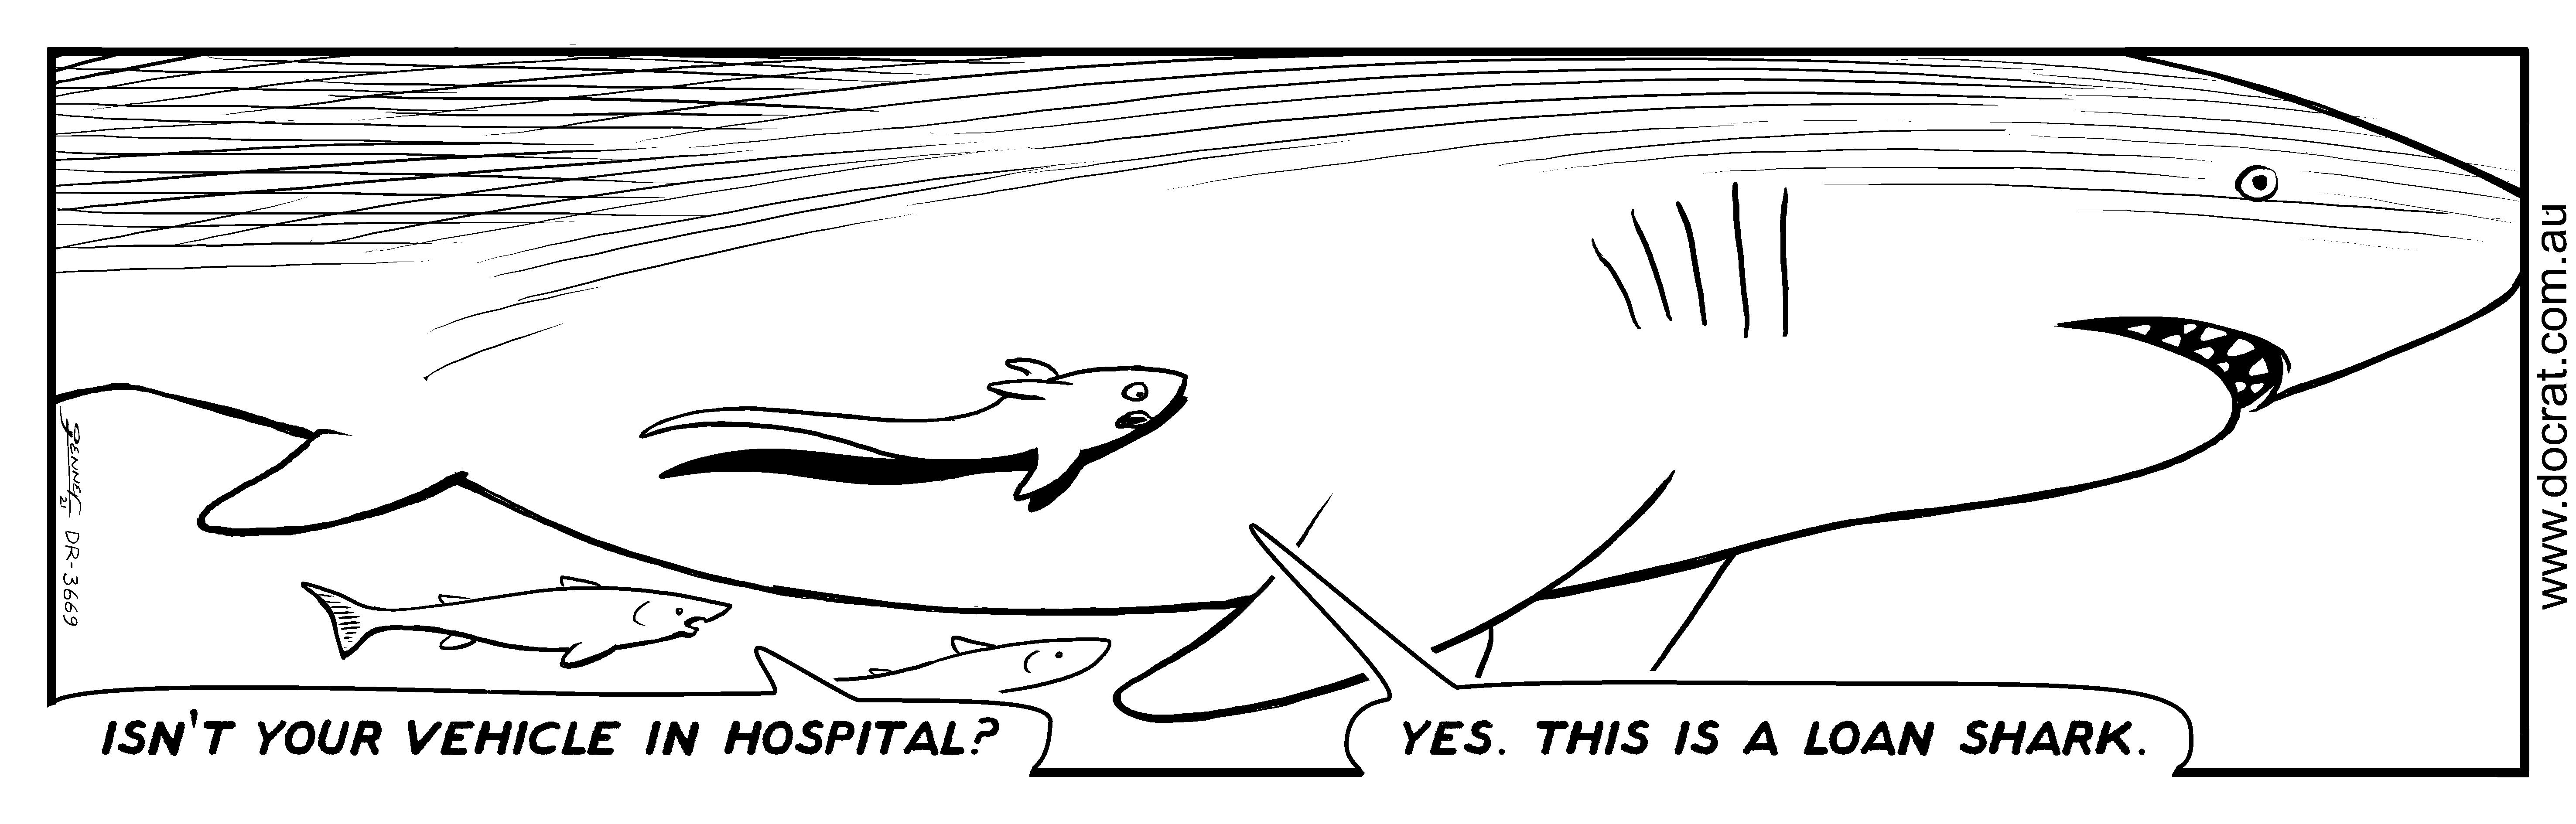 20210204